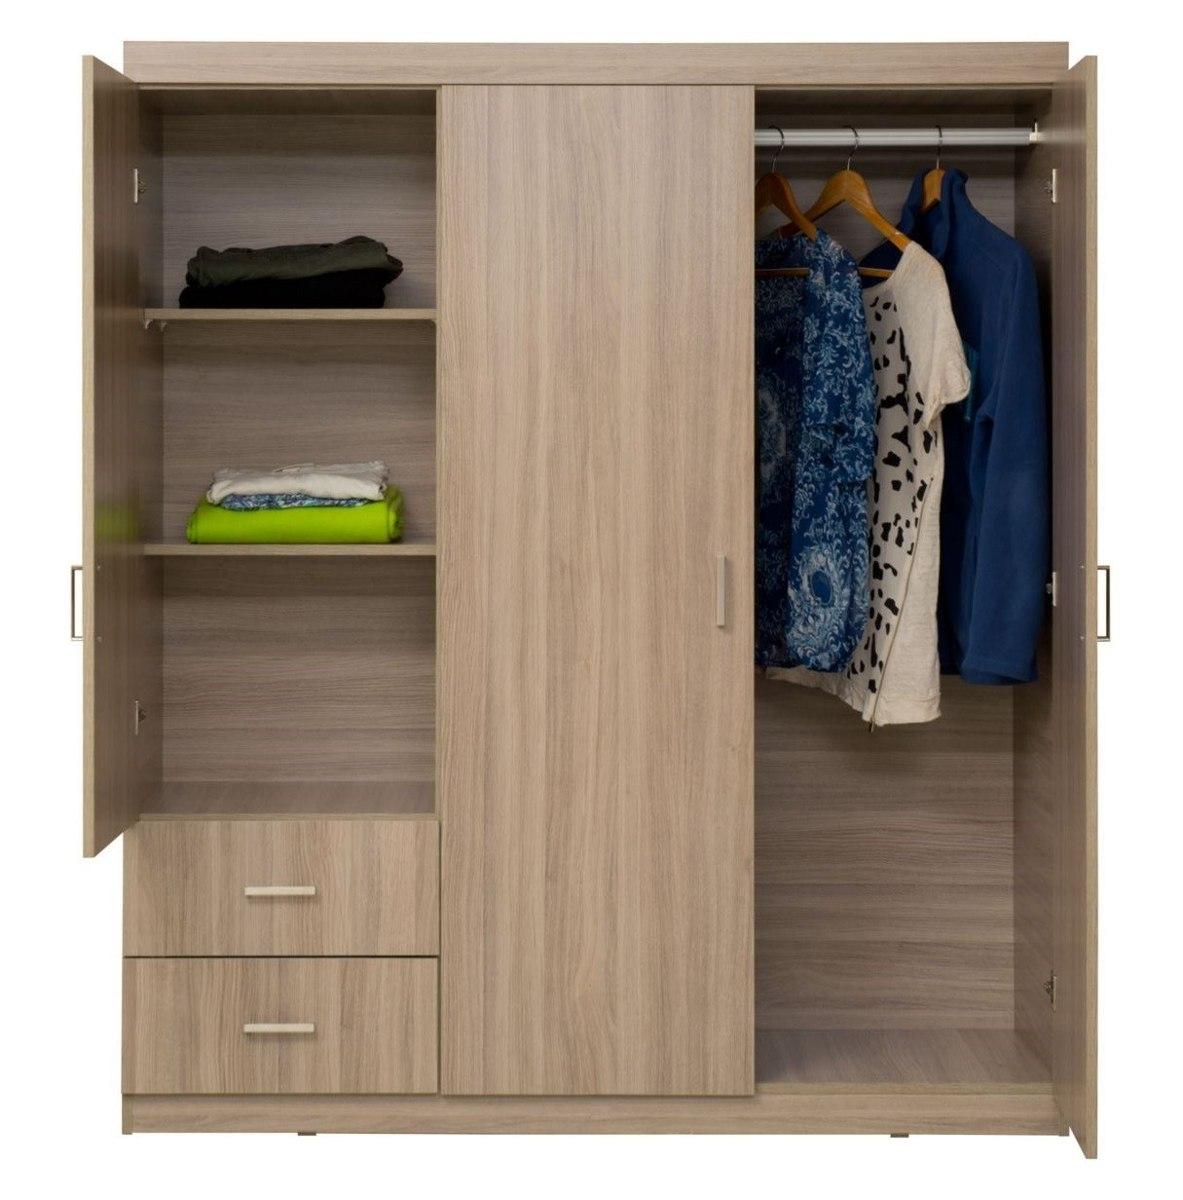 Closet armario moduart 3 puertas 2 cajones 160x140x46 - Armario 3 puertas ...